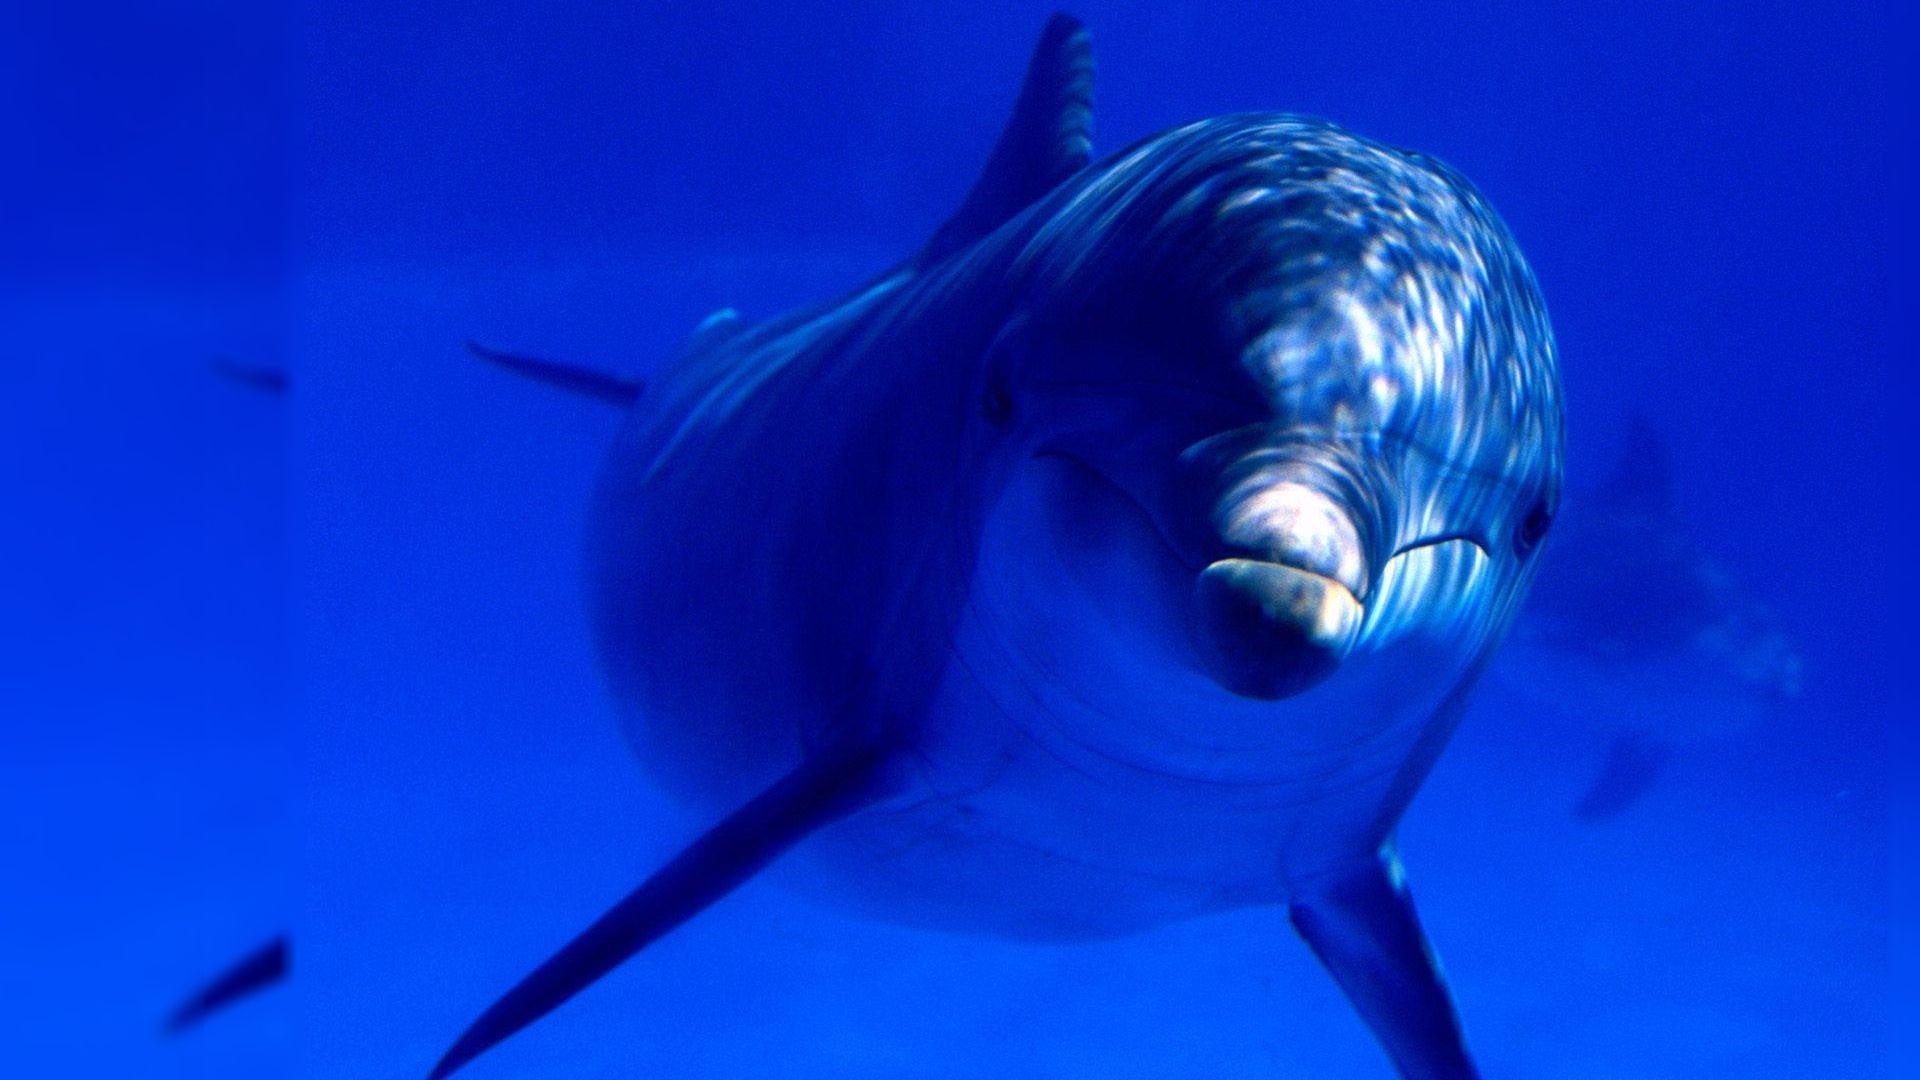 Download Dolphin Desktop Wallpaper | Full HD Wallpapers